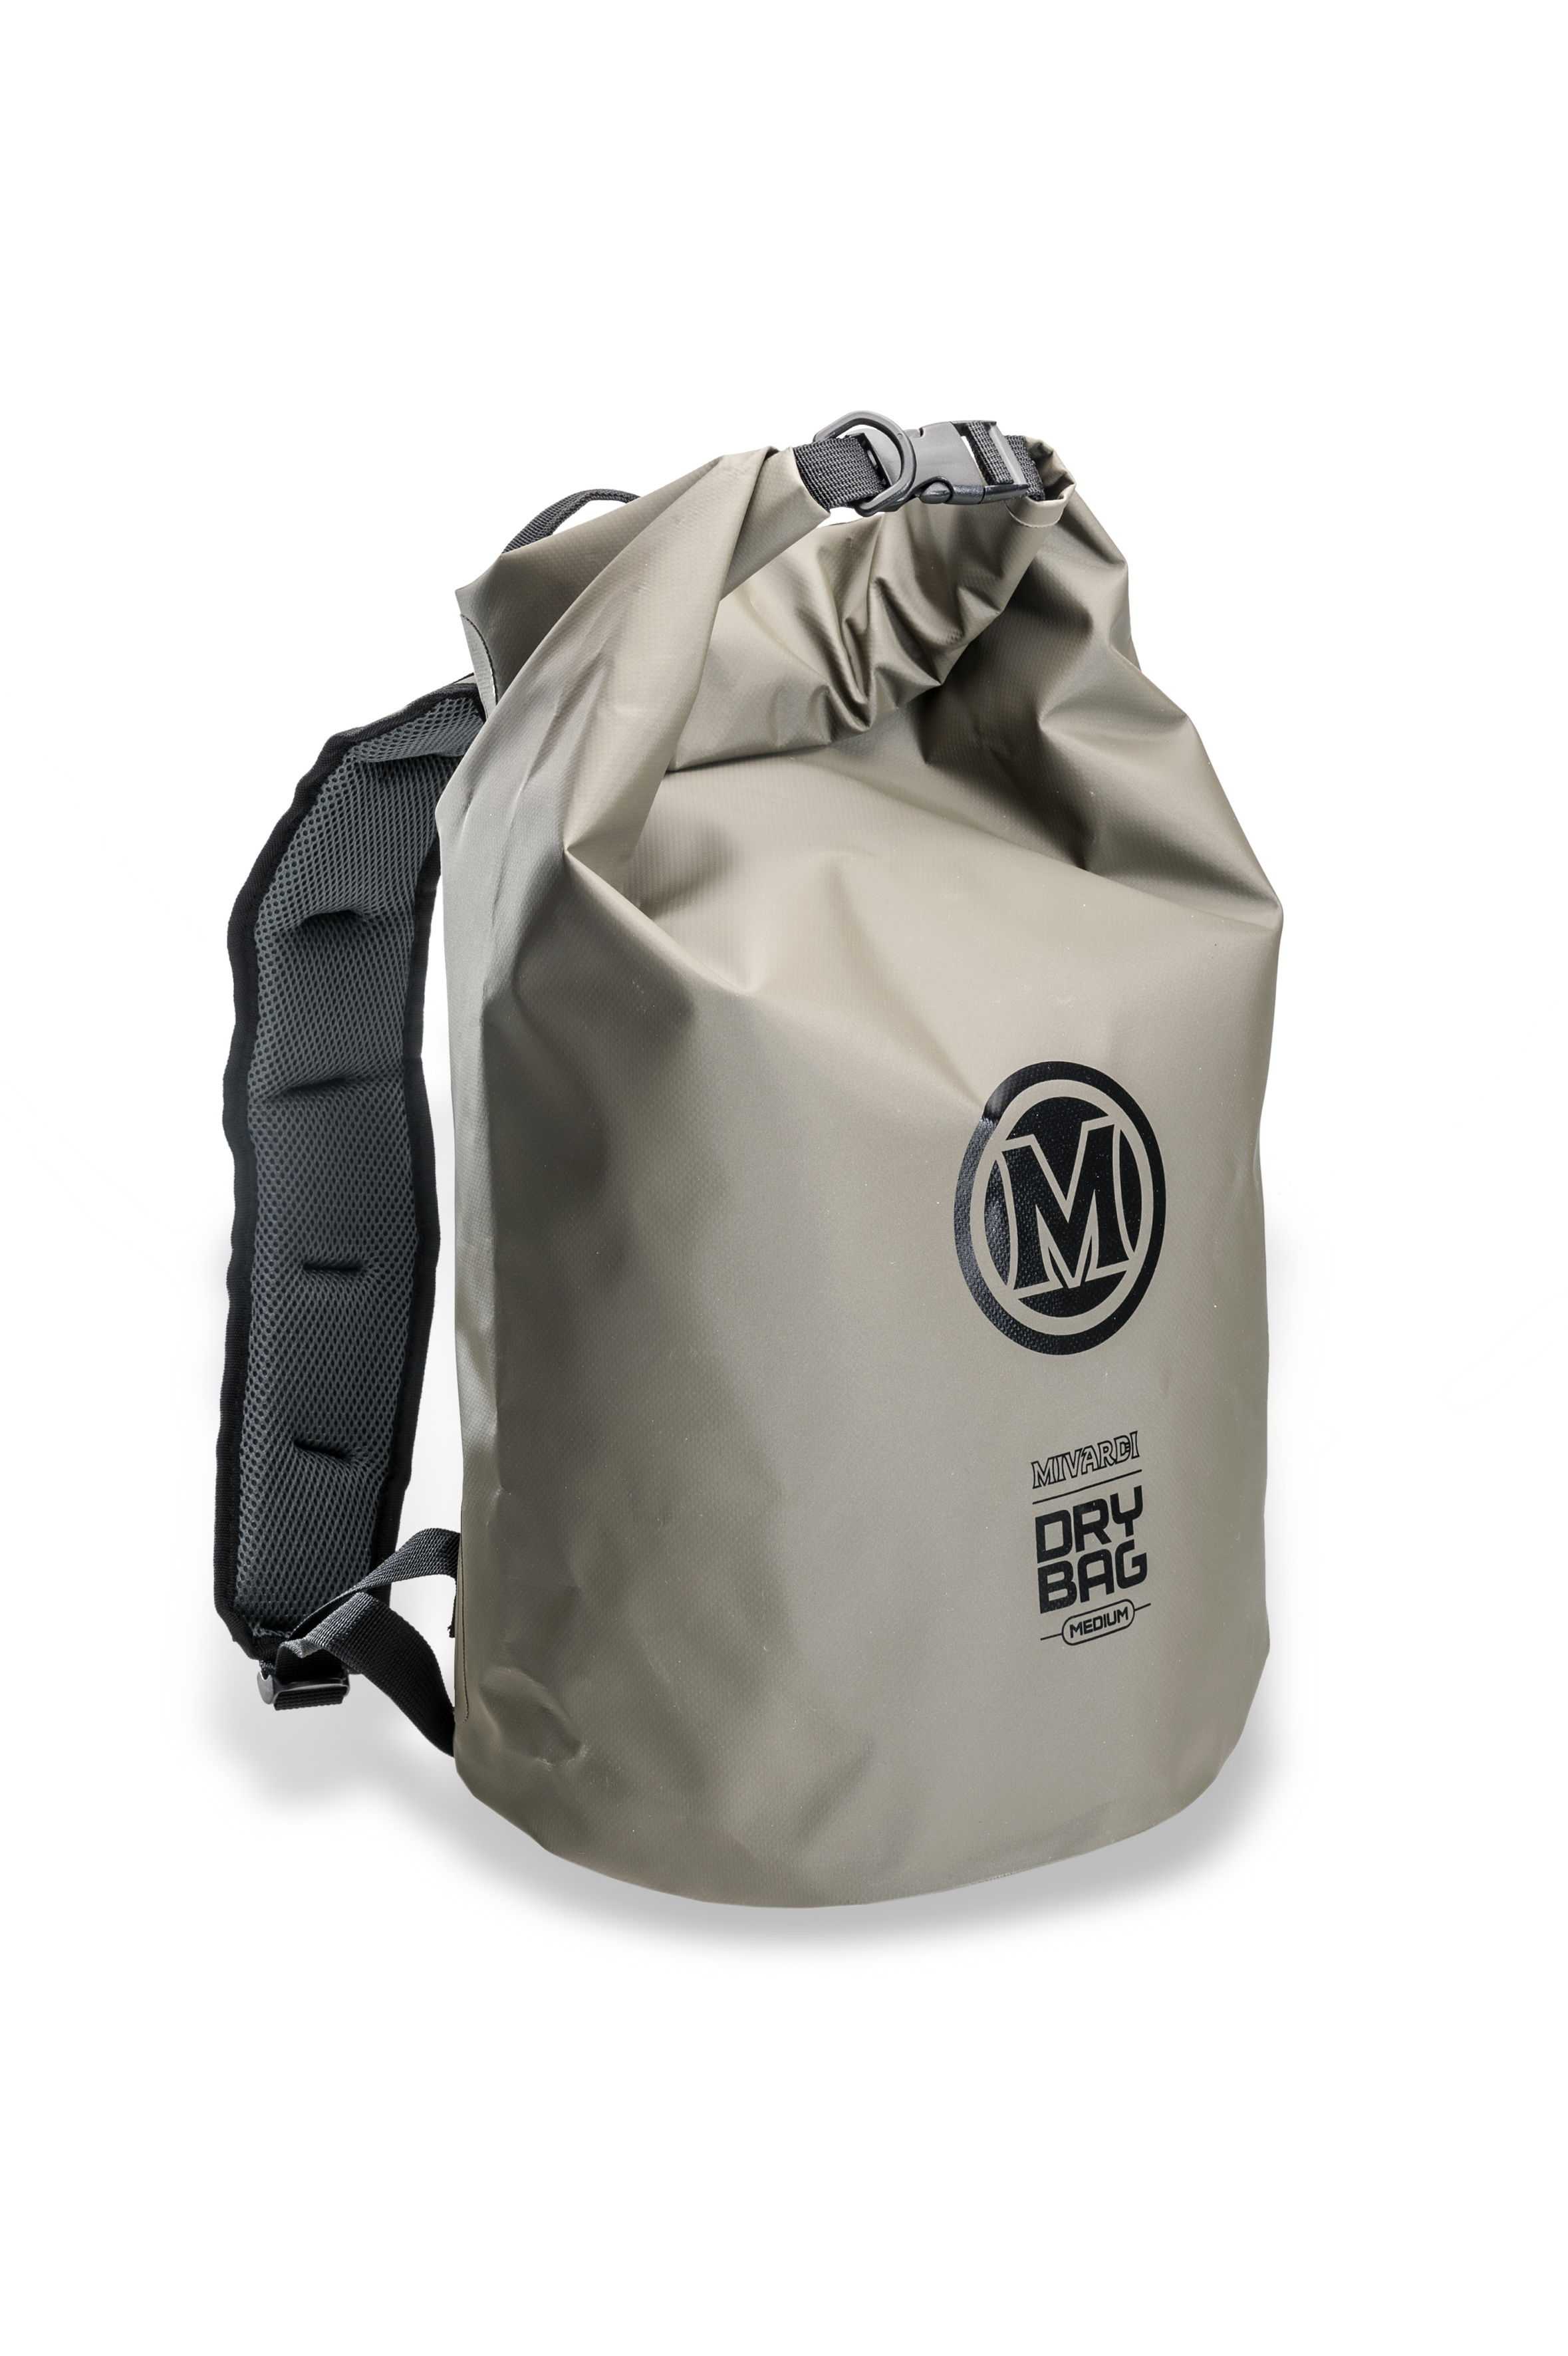 M-DBPR Dry bag Premium 30l